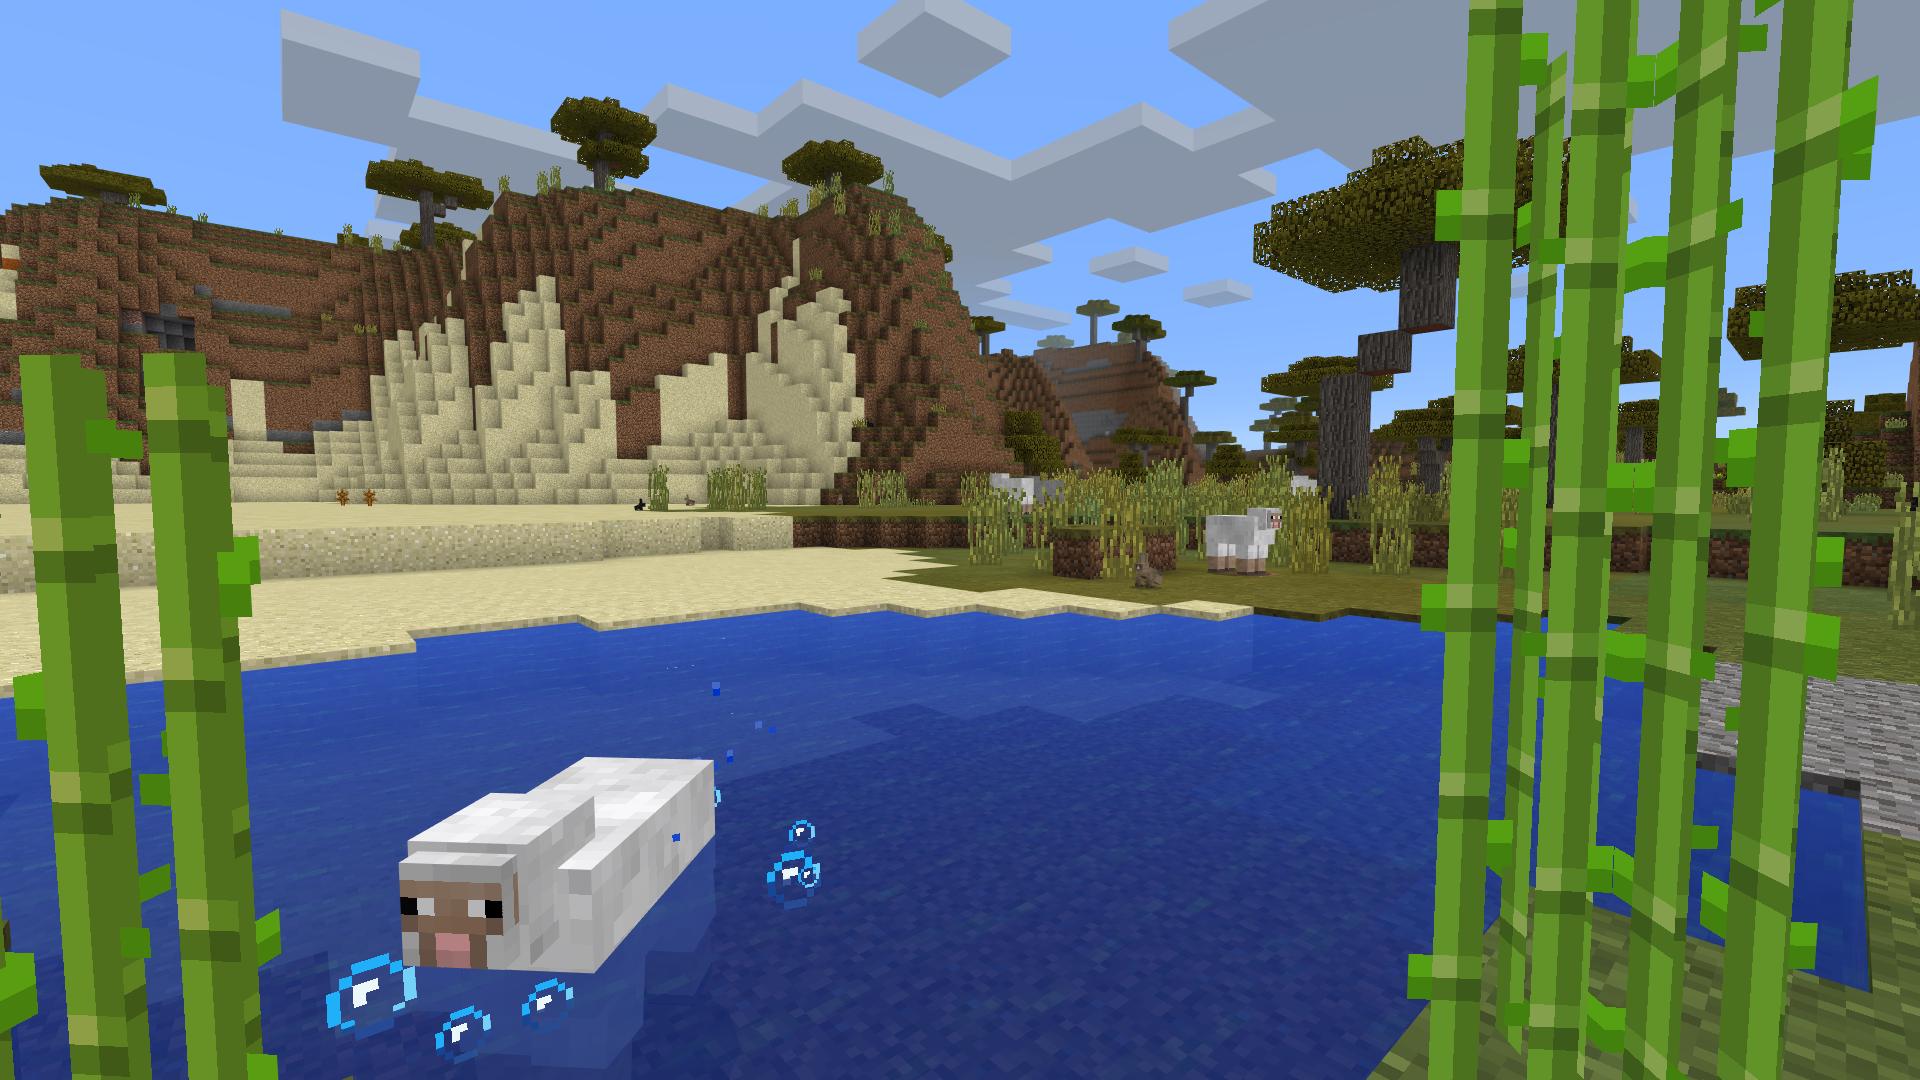 Minecraft: Apple TV Edition screenshot 1